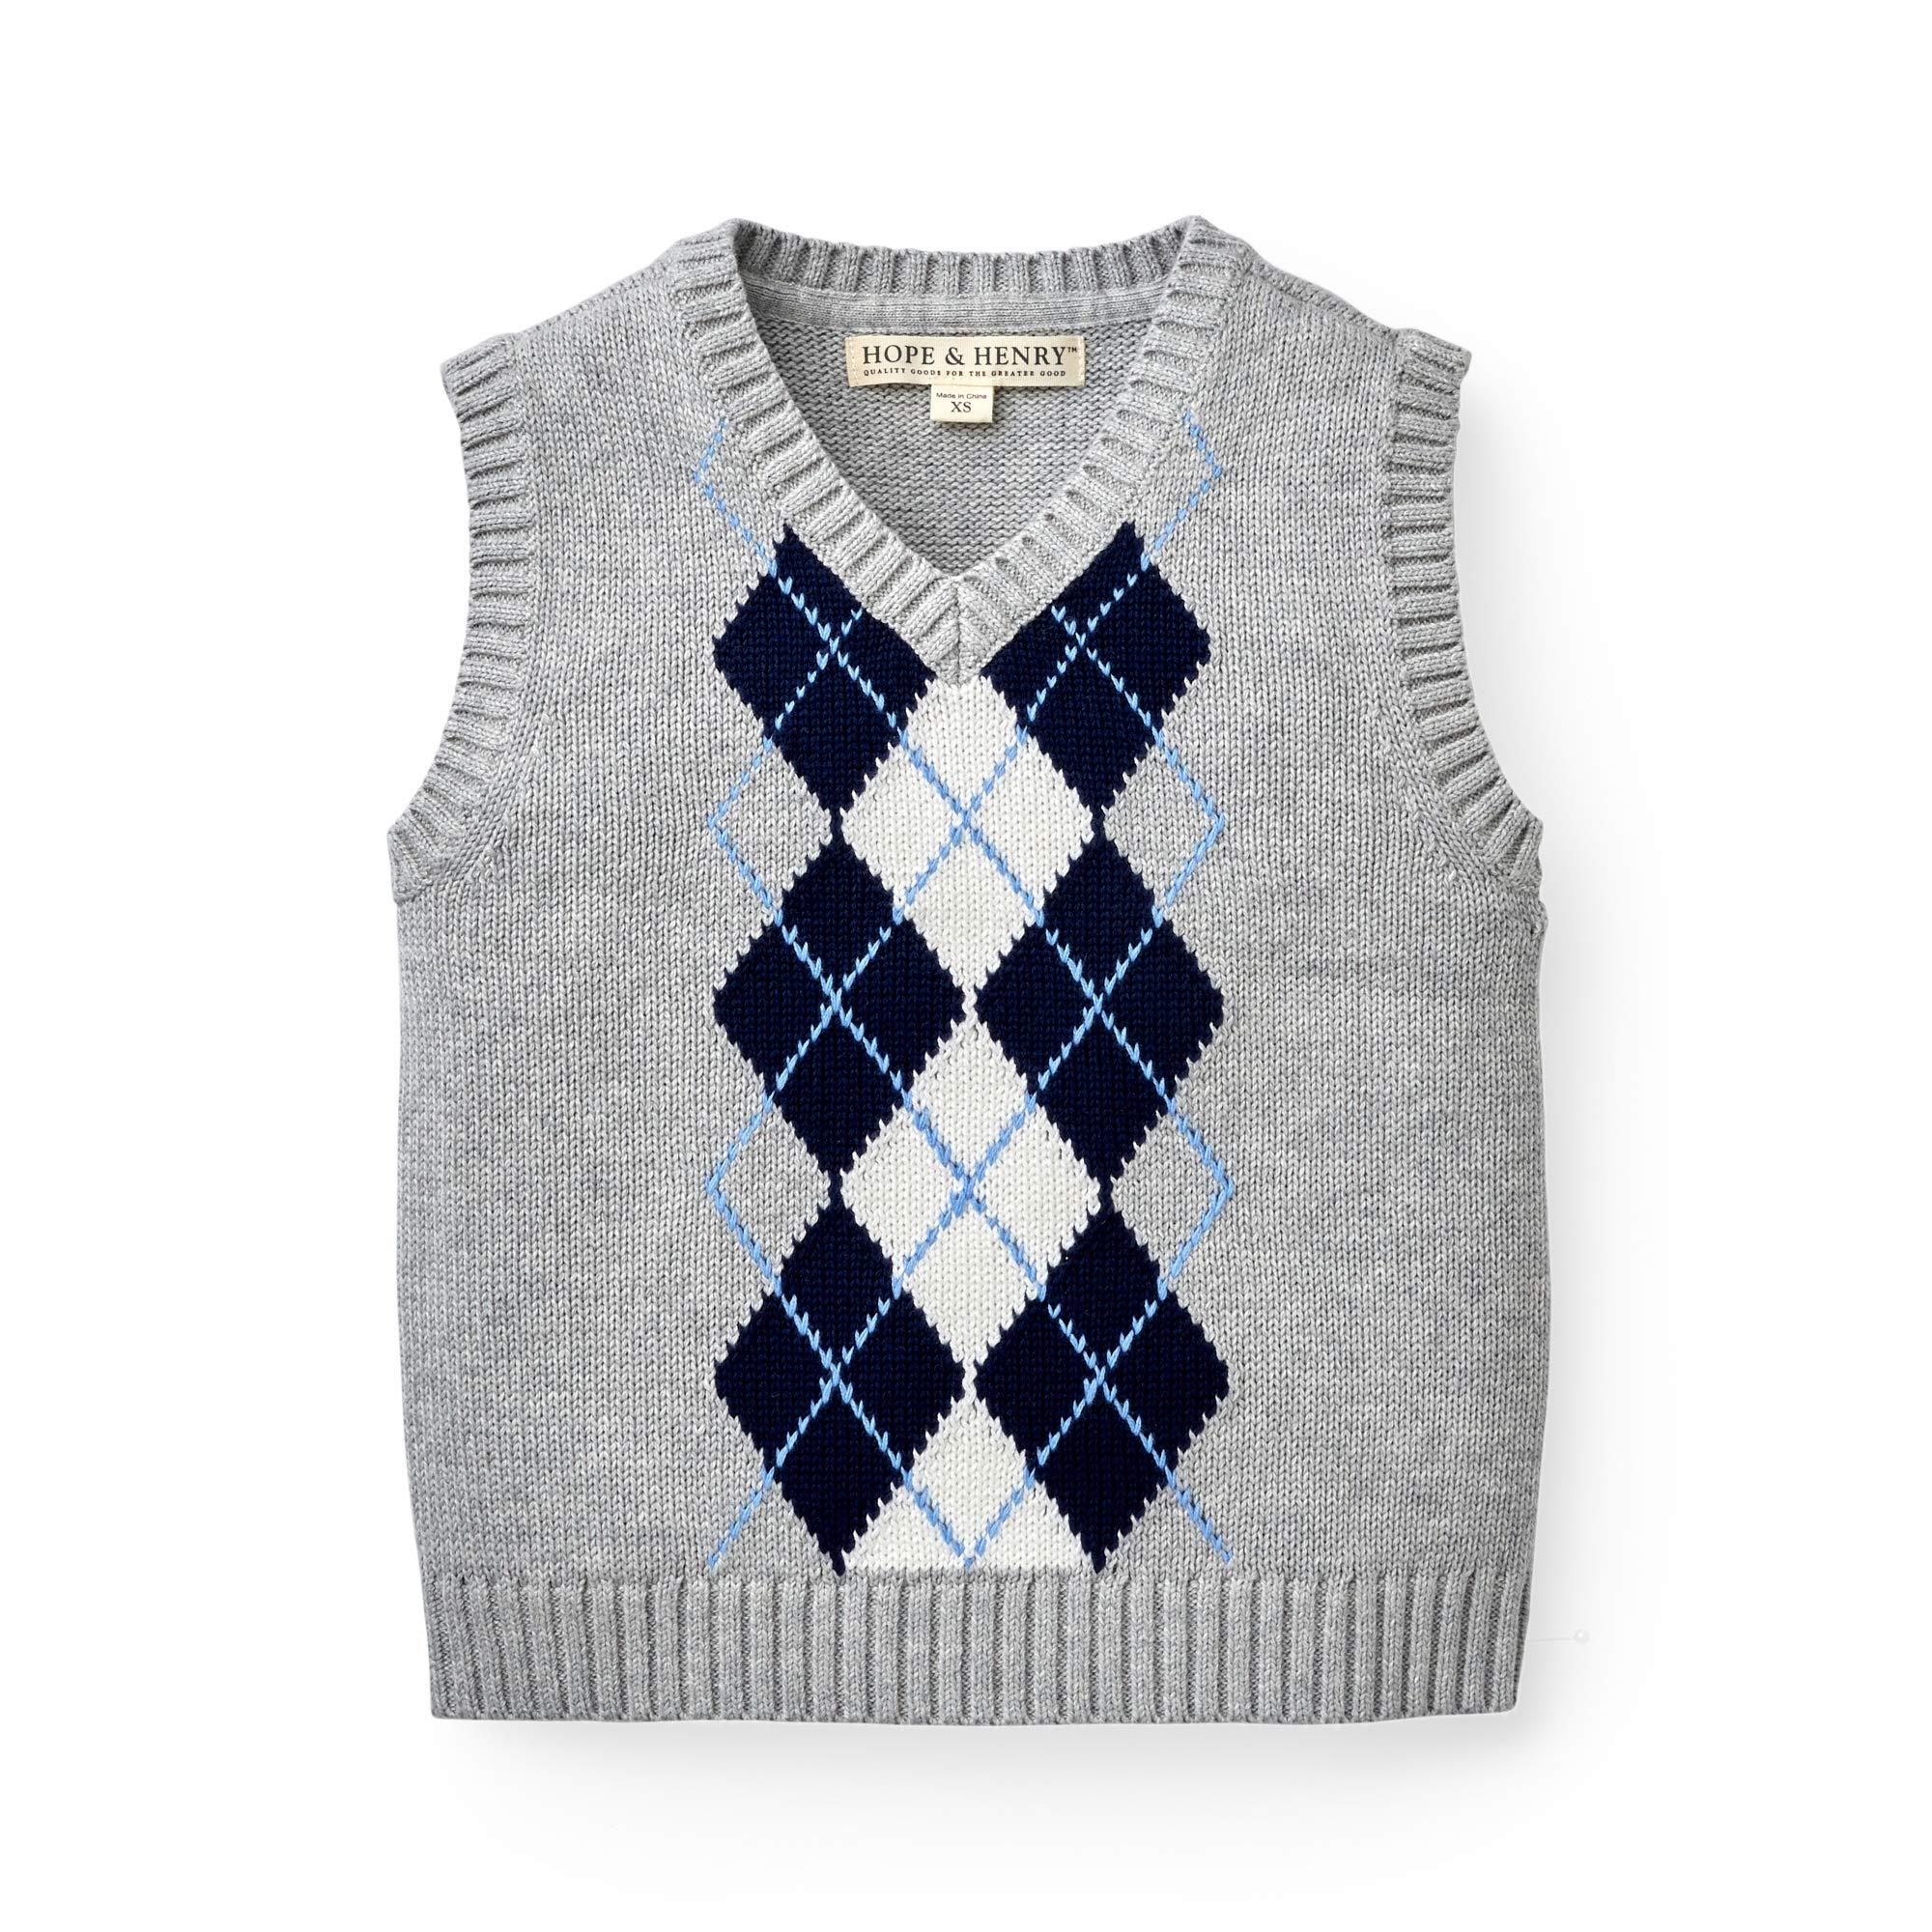 Hope & Henry Boys' Grey Argyle Cable Sweater Vest